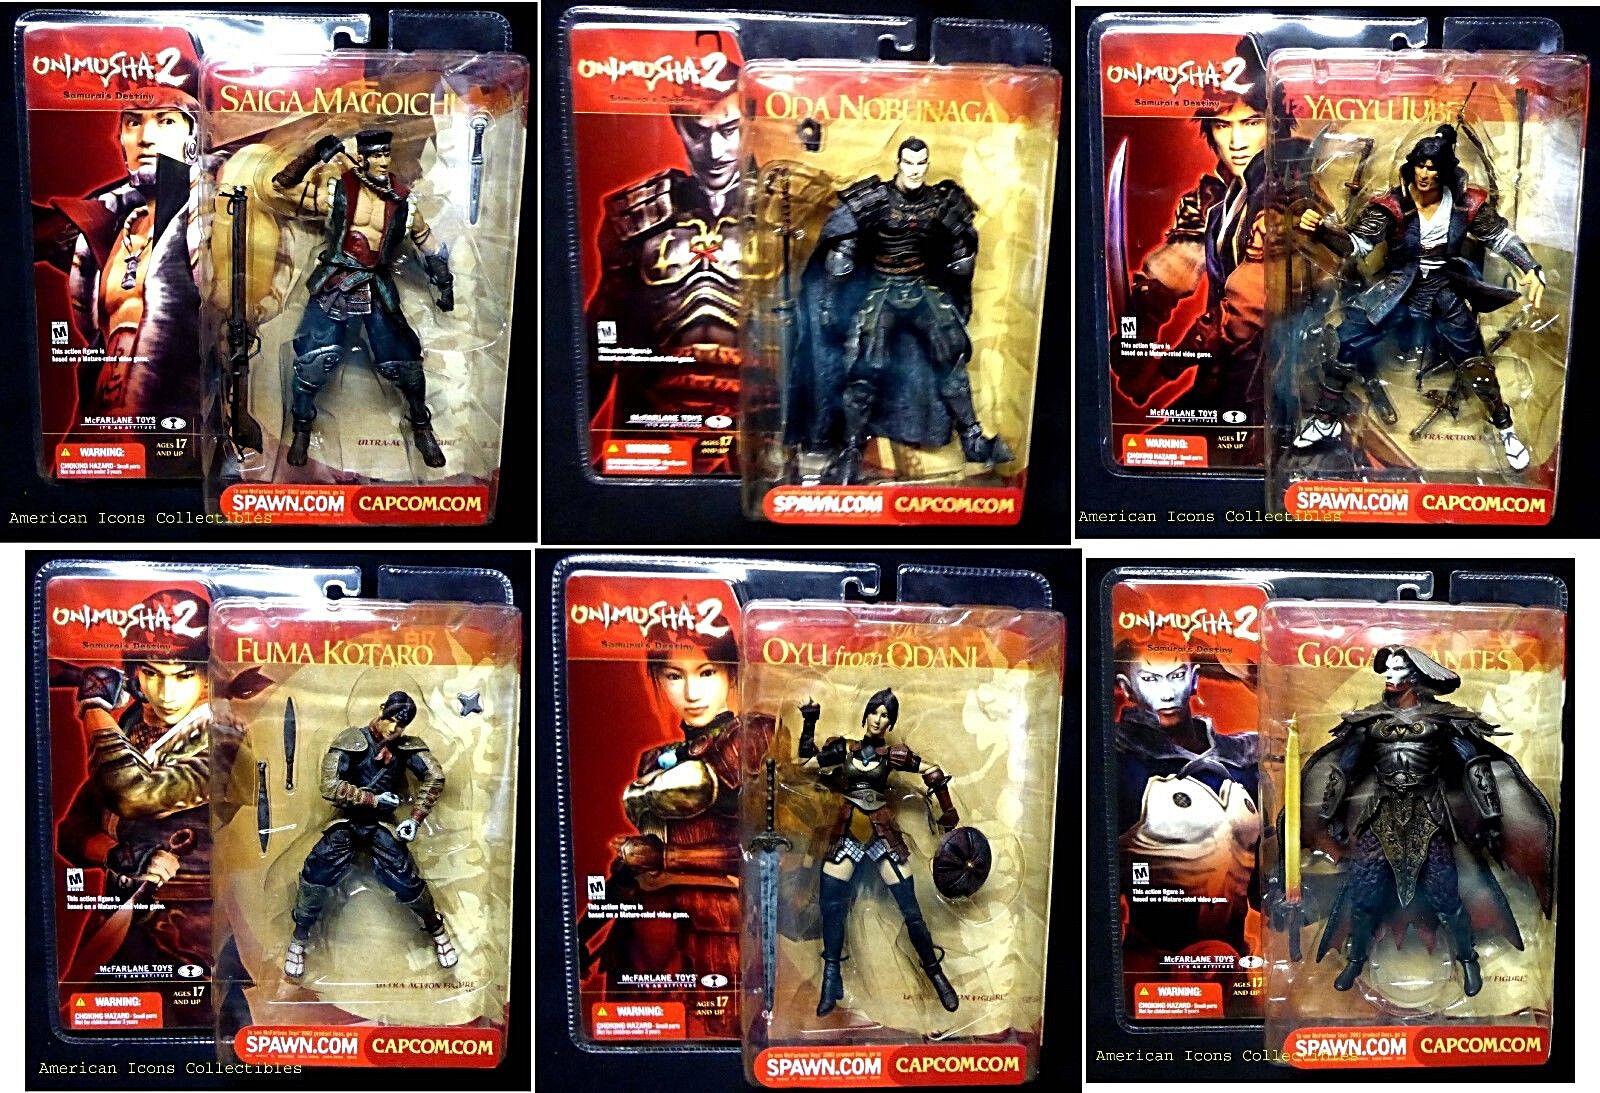 Onimusha 2 Samurai's Destiny 6 Action Figure Set McFarlane Toys Nuovo From 2002